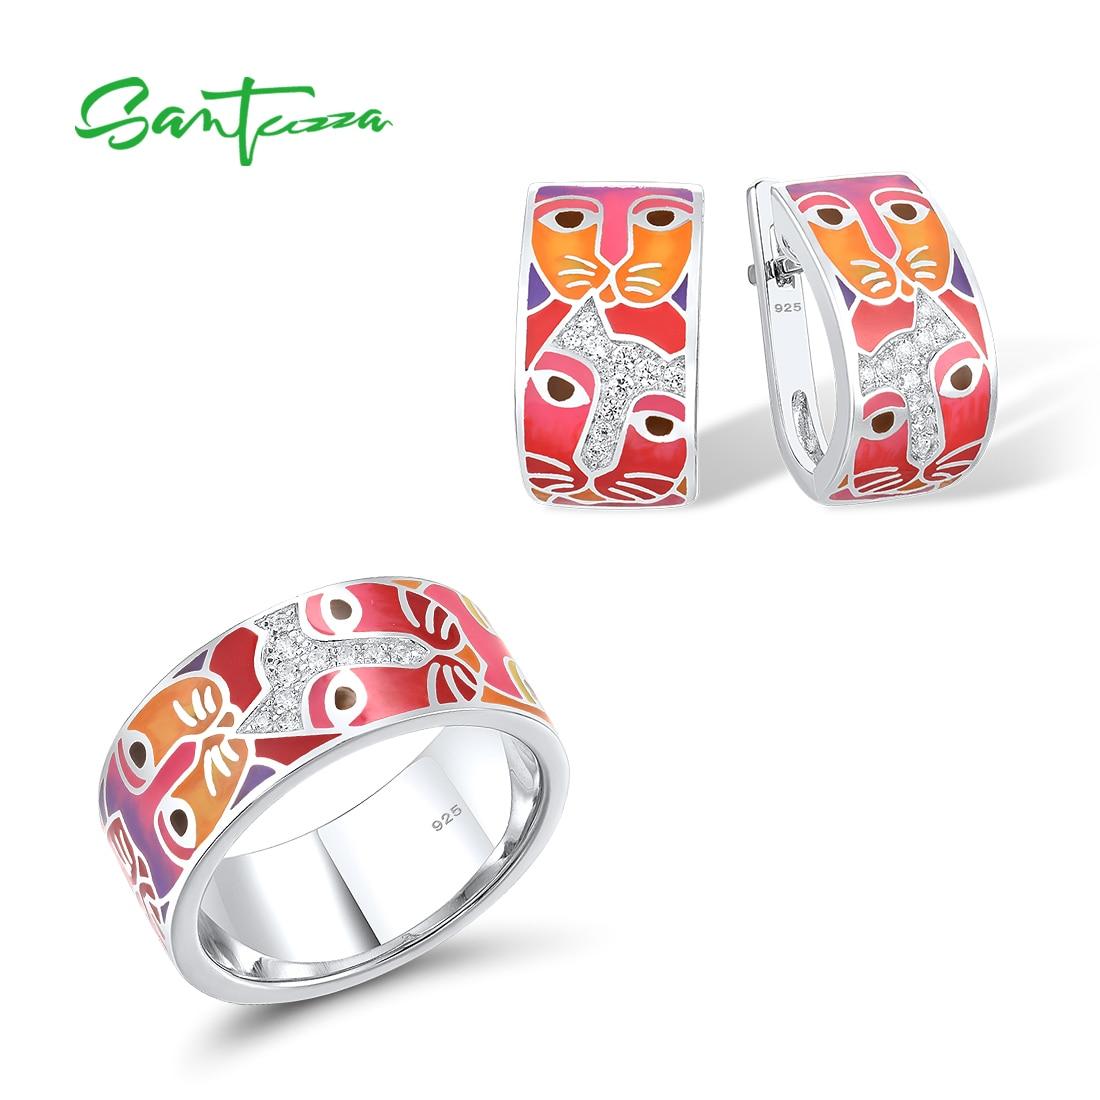 Promo SANTUZZA Pure 925 Sterling Silver Jewelry Set For Woman White CZ Red Cat Enamel Ring Earrings Set Lovely Fine Jewelry Handmade